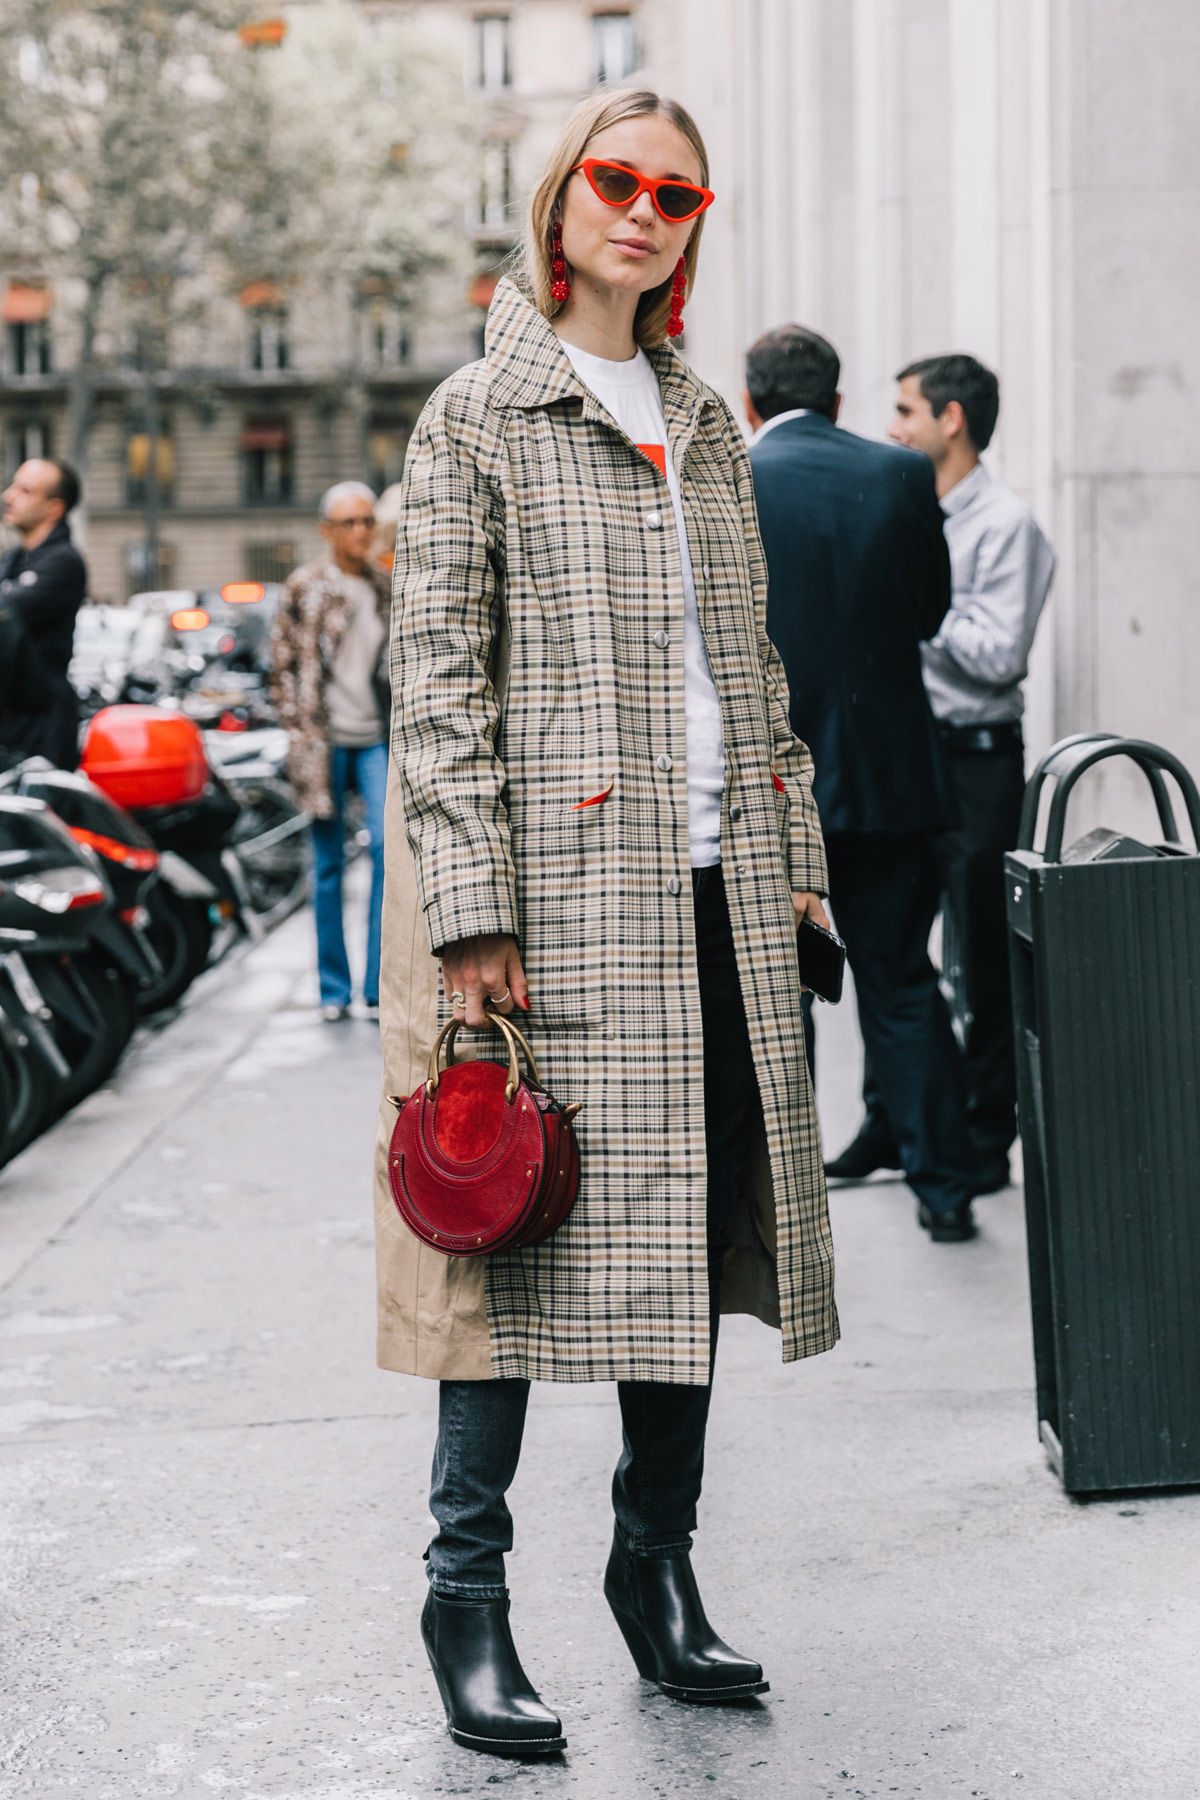 street_style_paris_fashion_week_dia3_balmain_chloe_isabel_maran_454787250_1200x1800